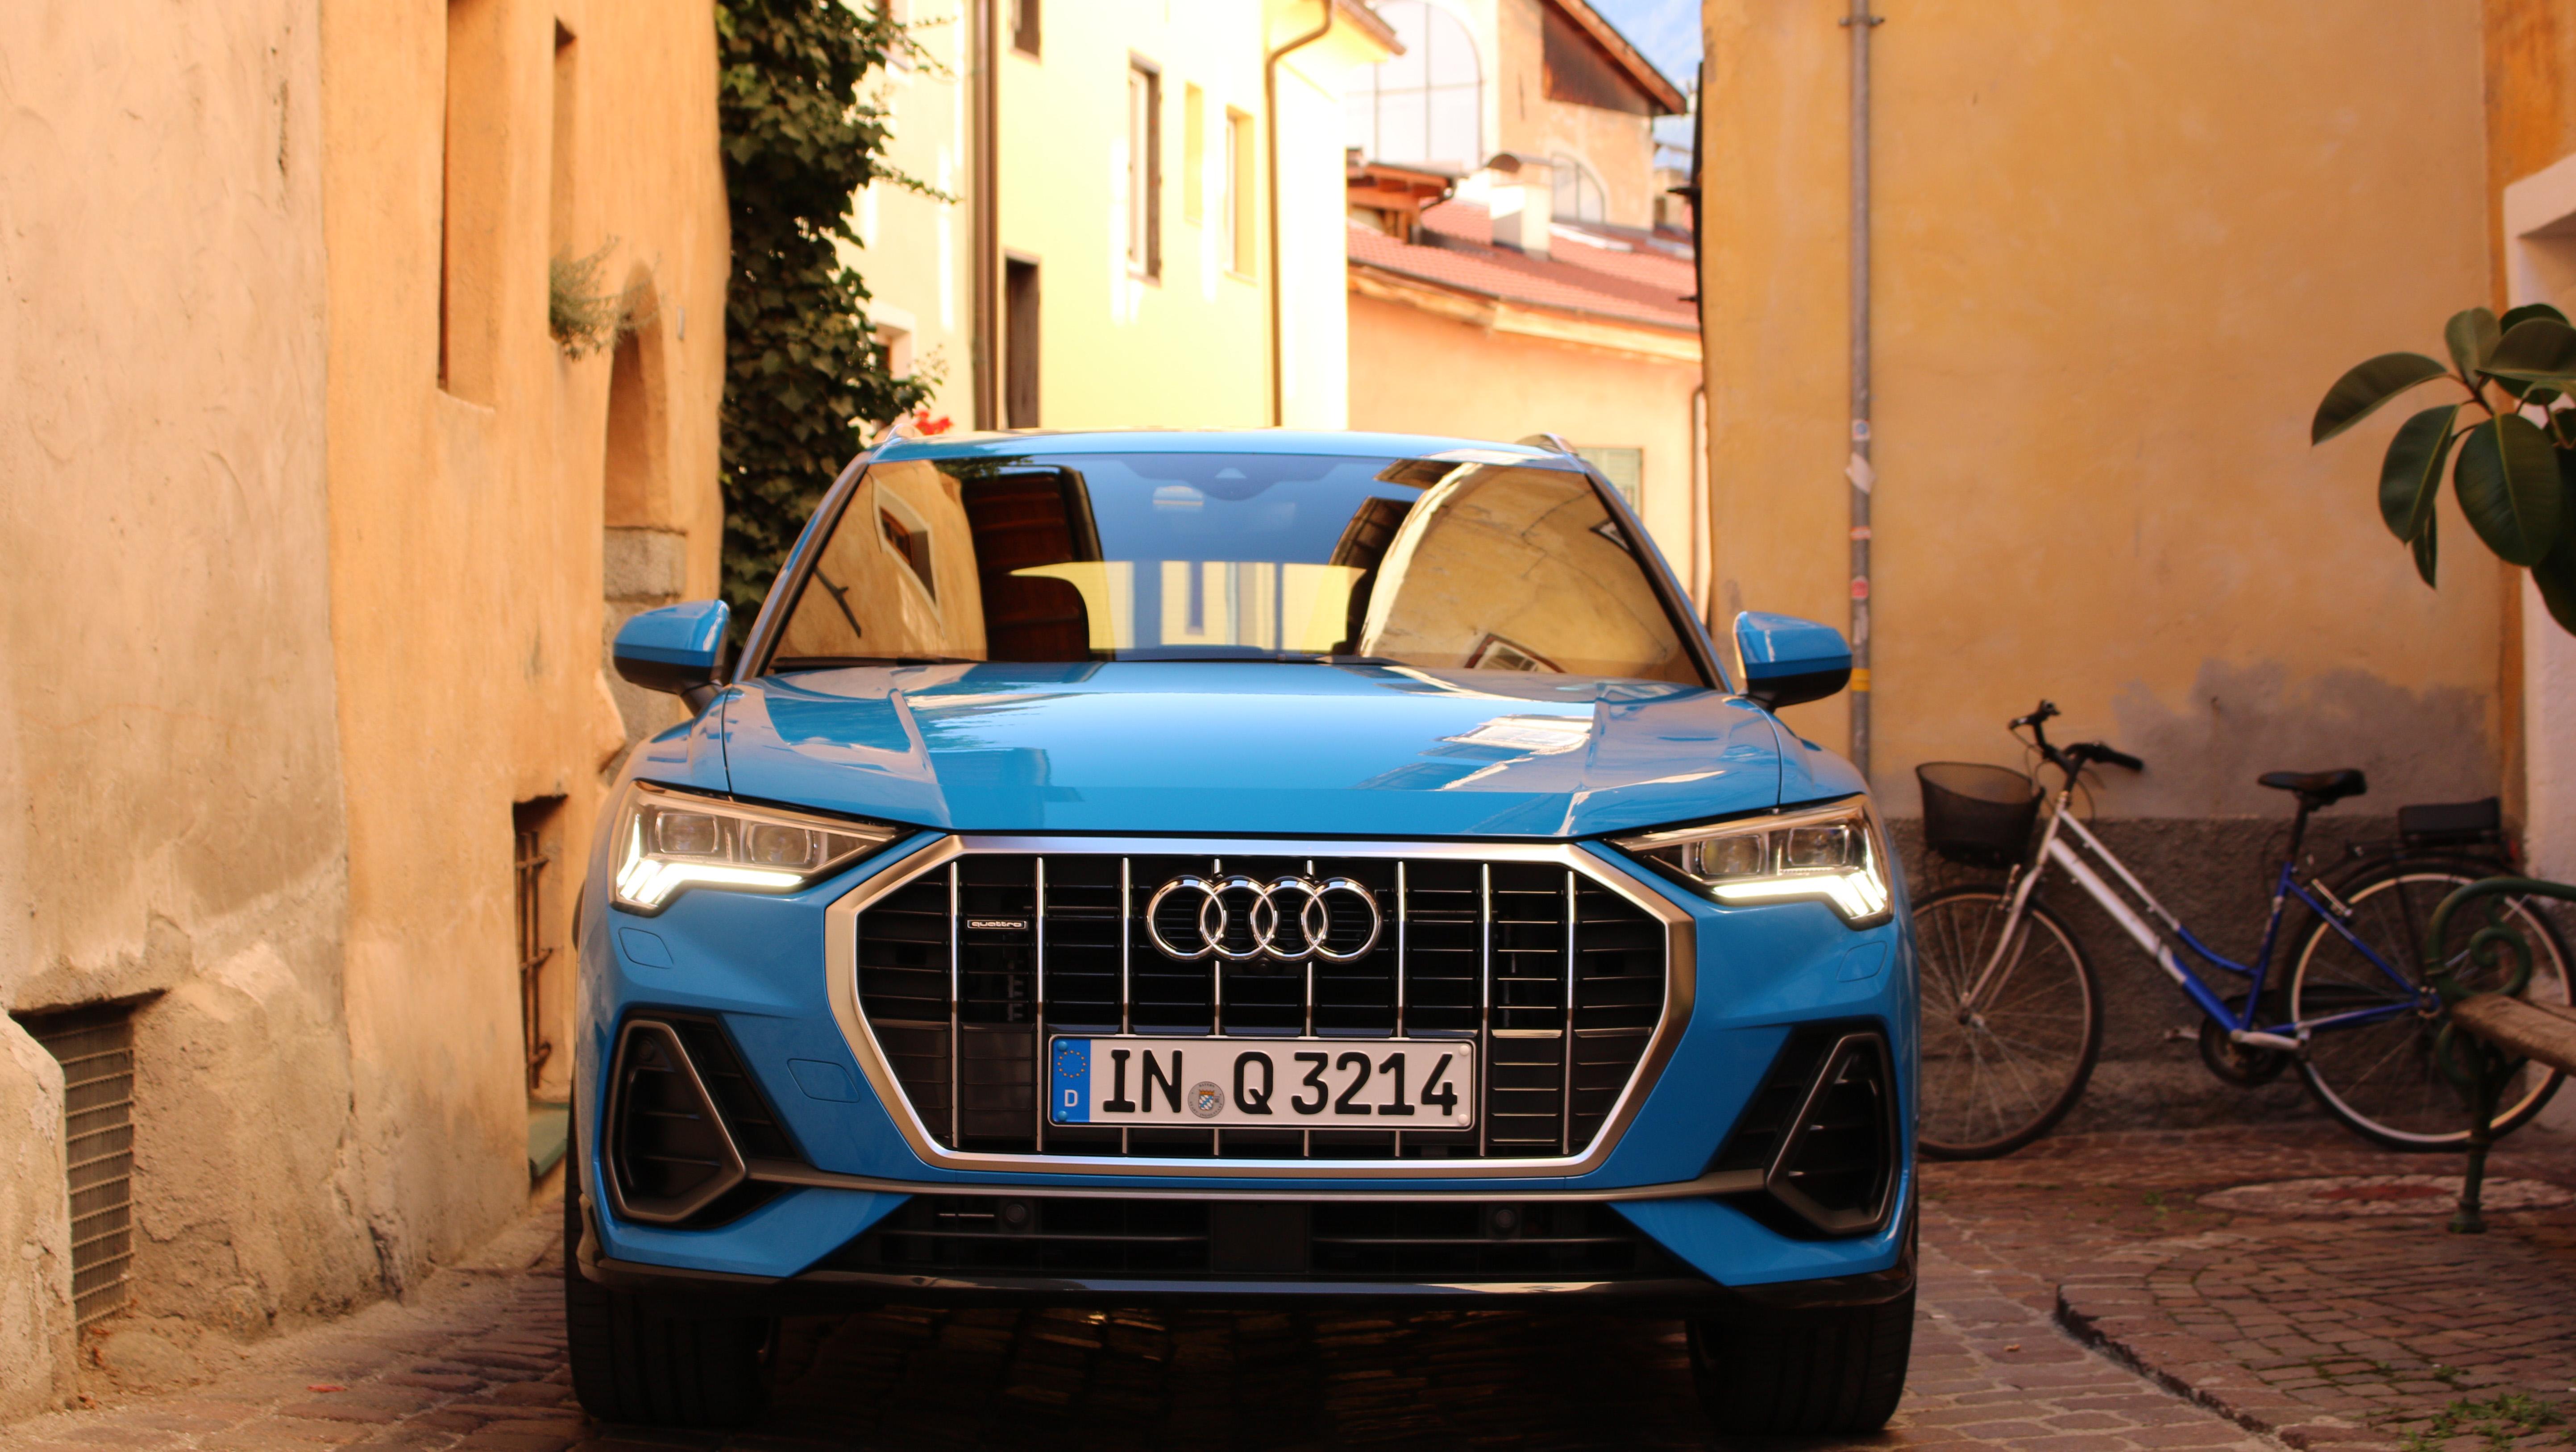 Audi Q3 S Line 2019 Bianca Audi Cars Review Release Raiacarscom